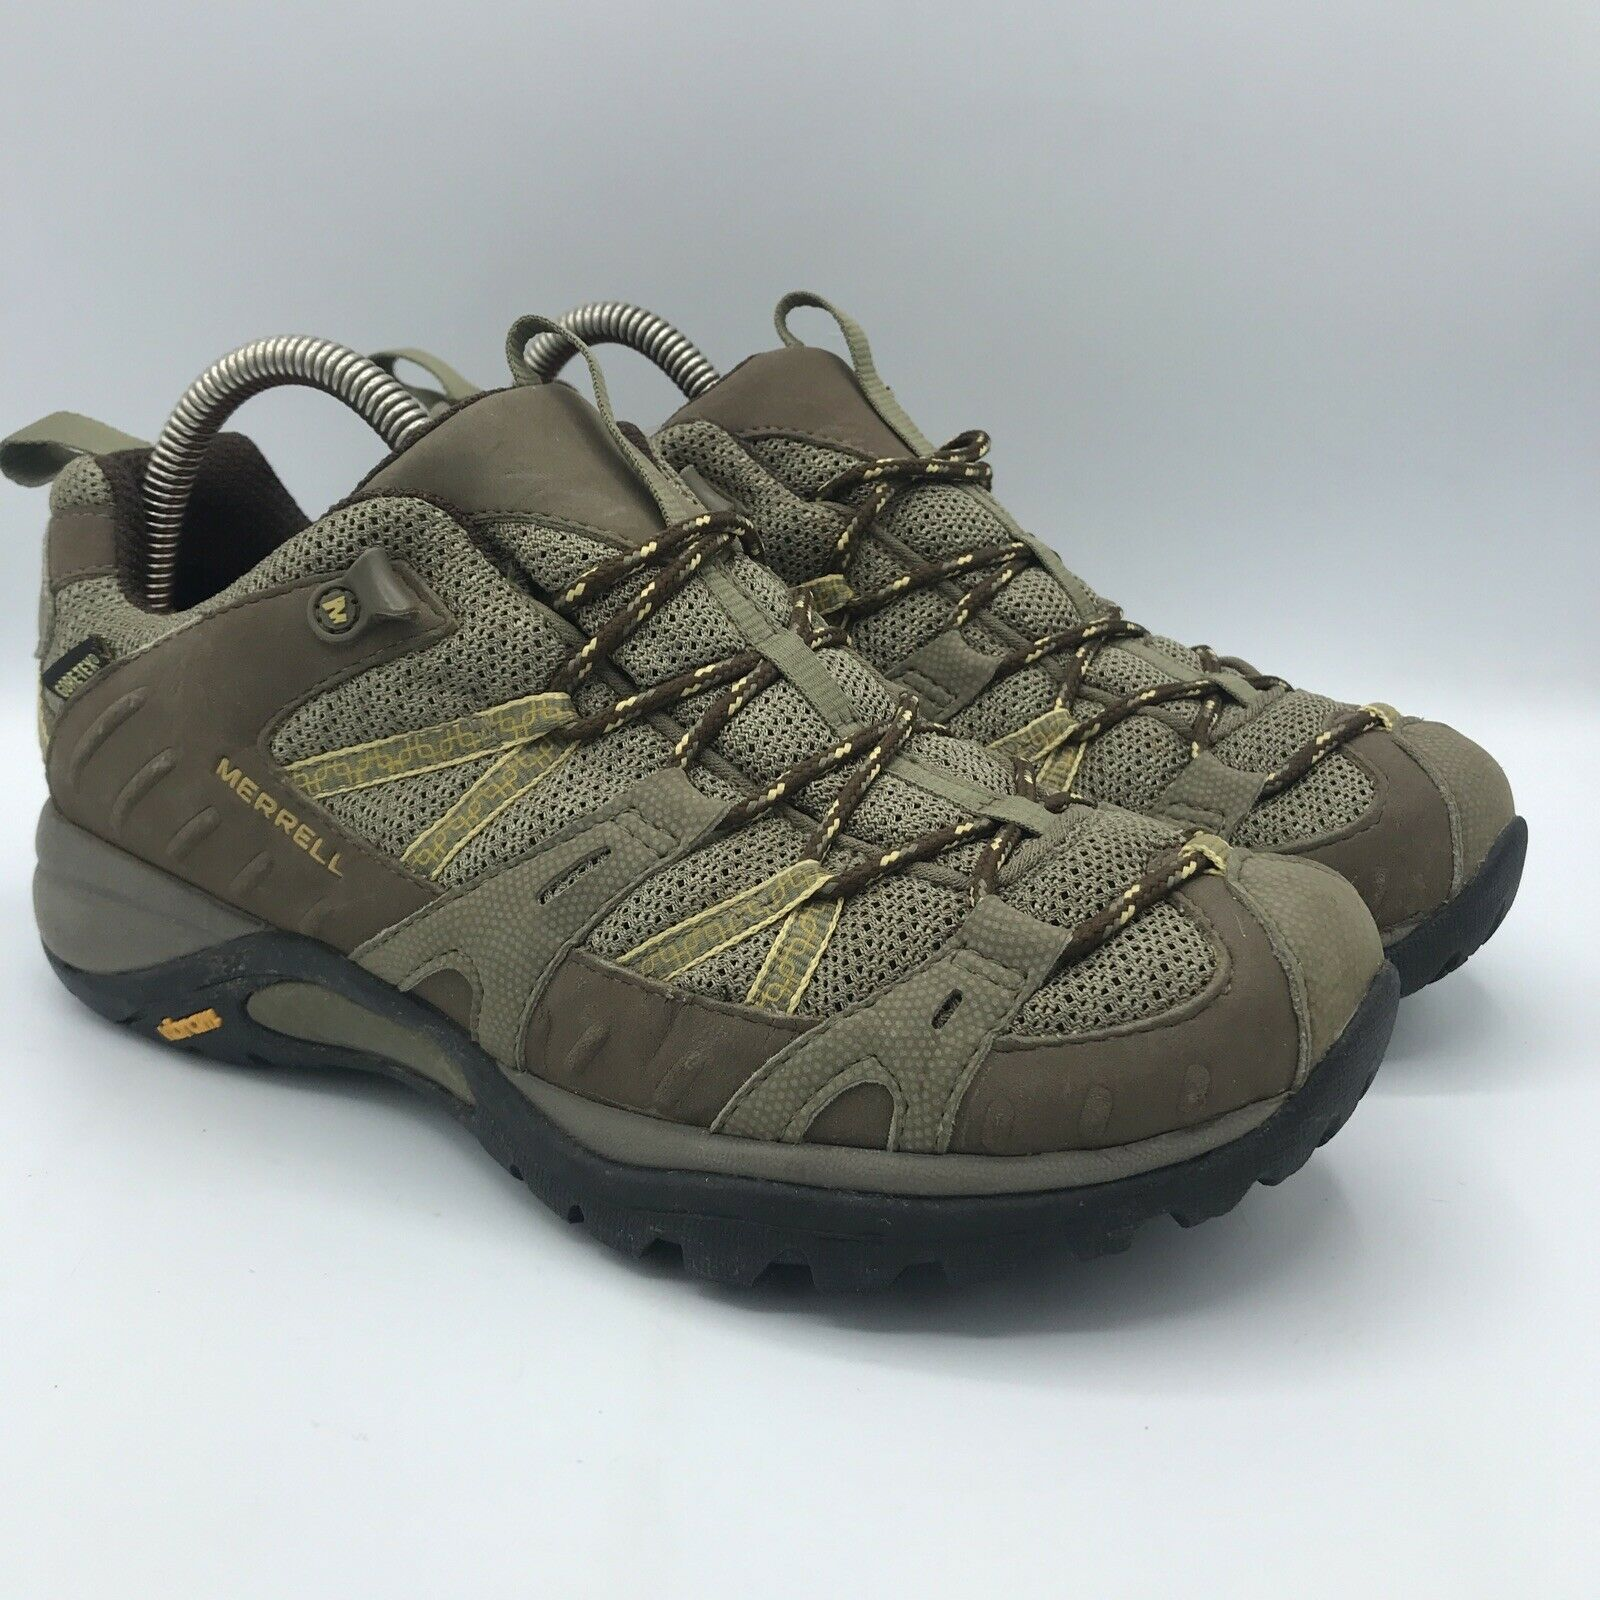 Merrell Siren Sport GORE-TEX XCR Chaussures de randonnée Brindle Femmes Marron Taille 8